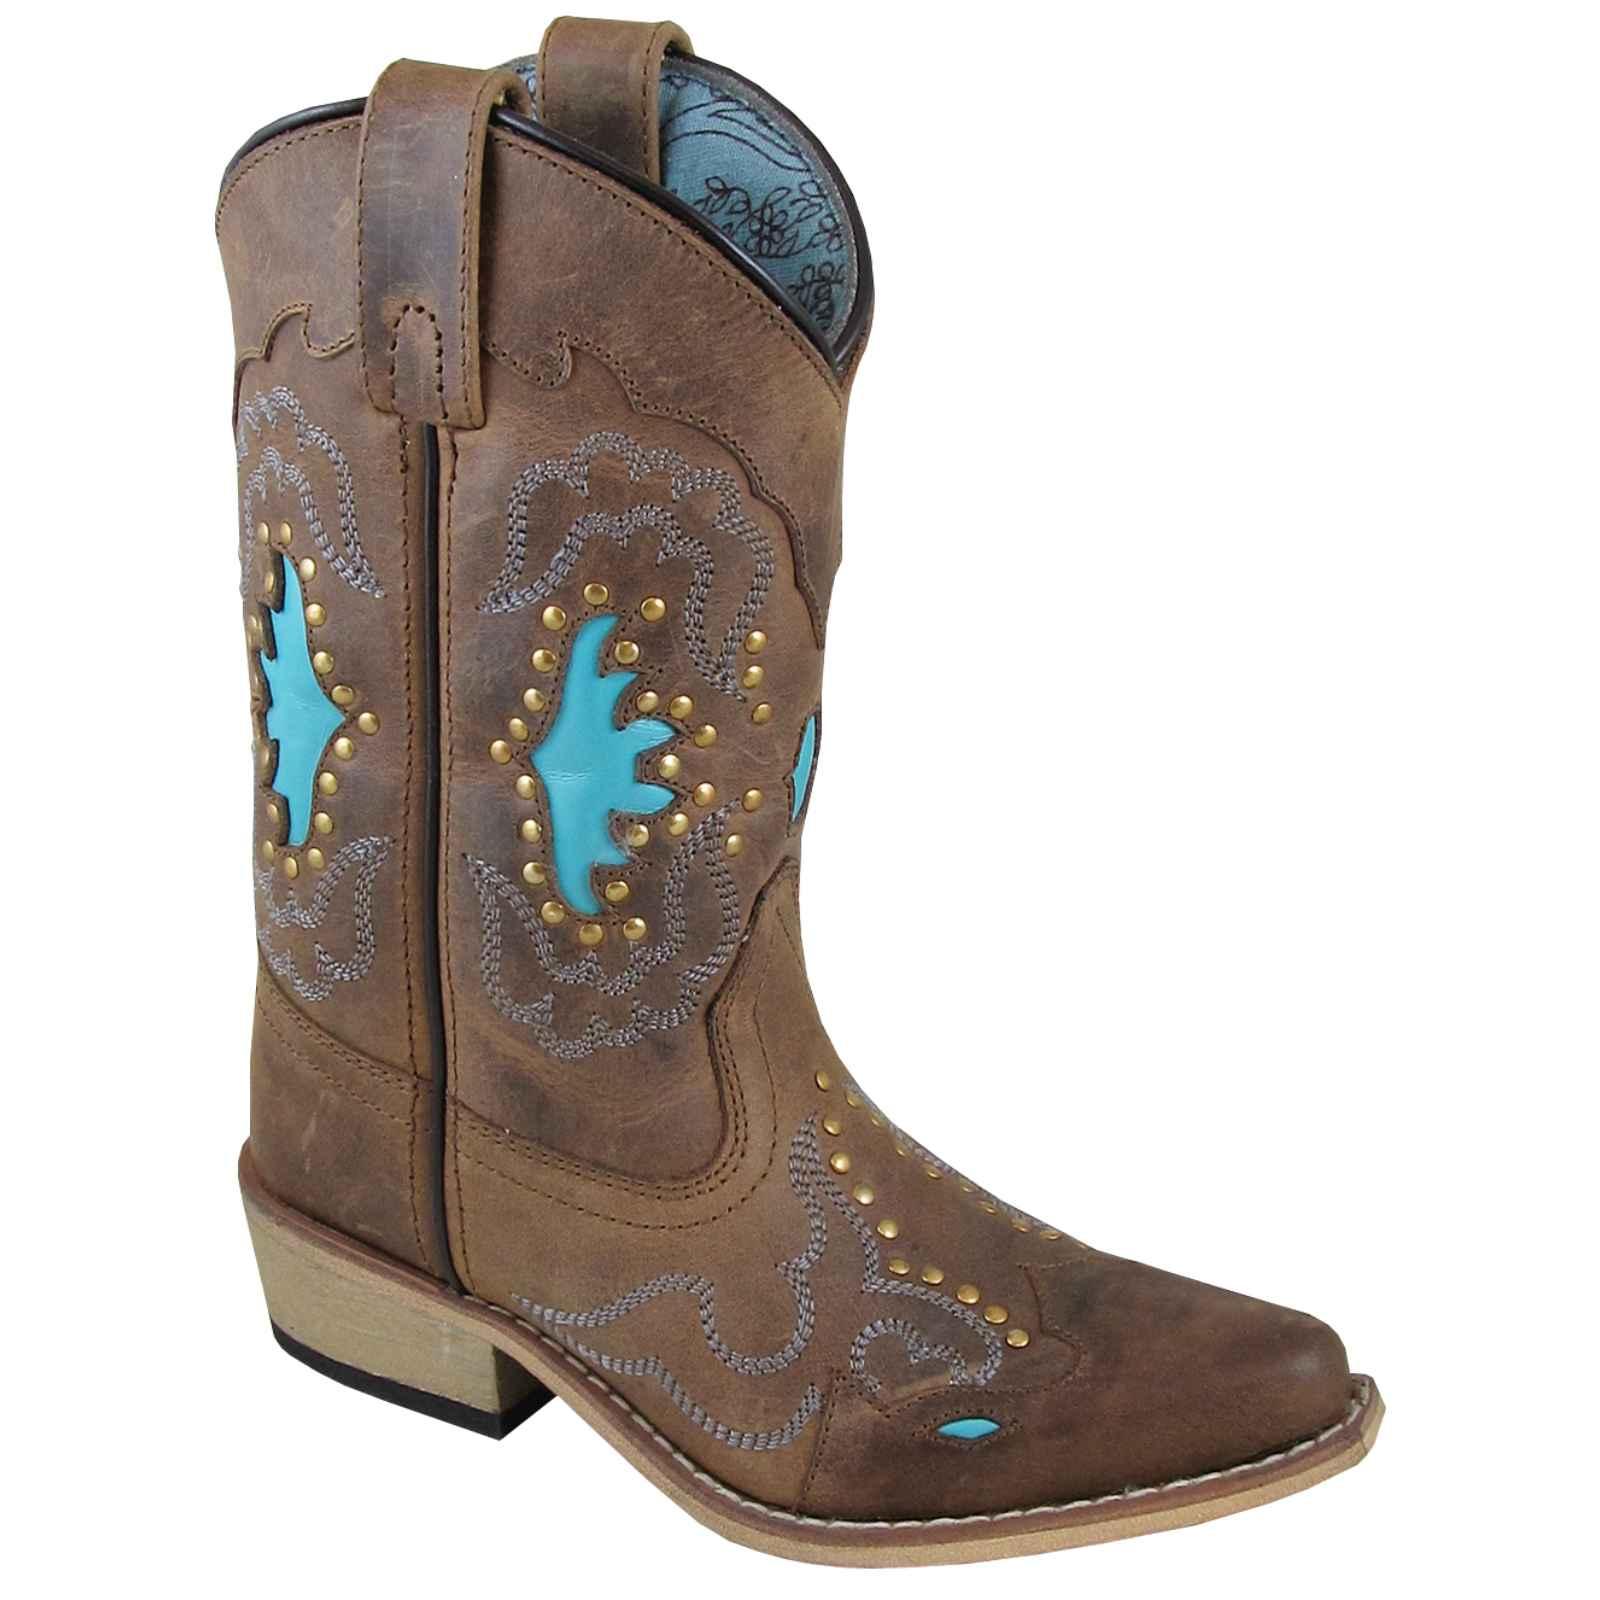 Smoky Mountain Girls' Moonbay Turquoise Inlay Cowgirl Boot Snip Toe - 3716C